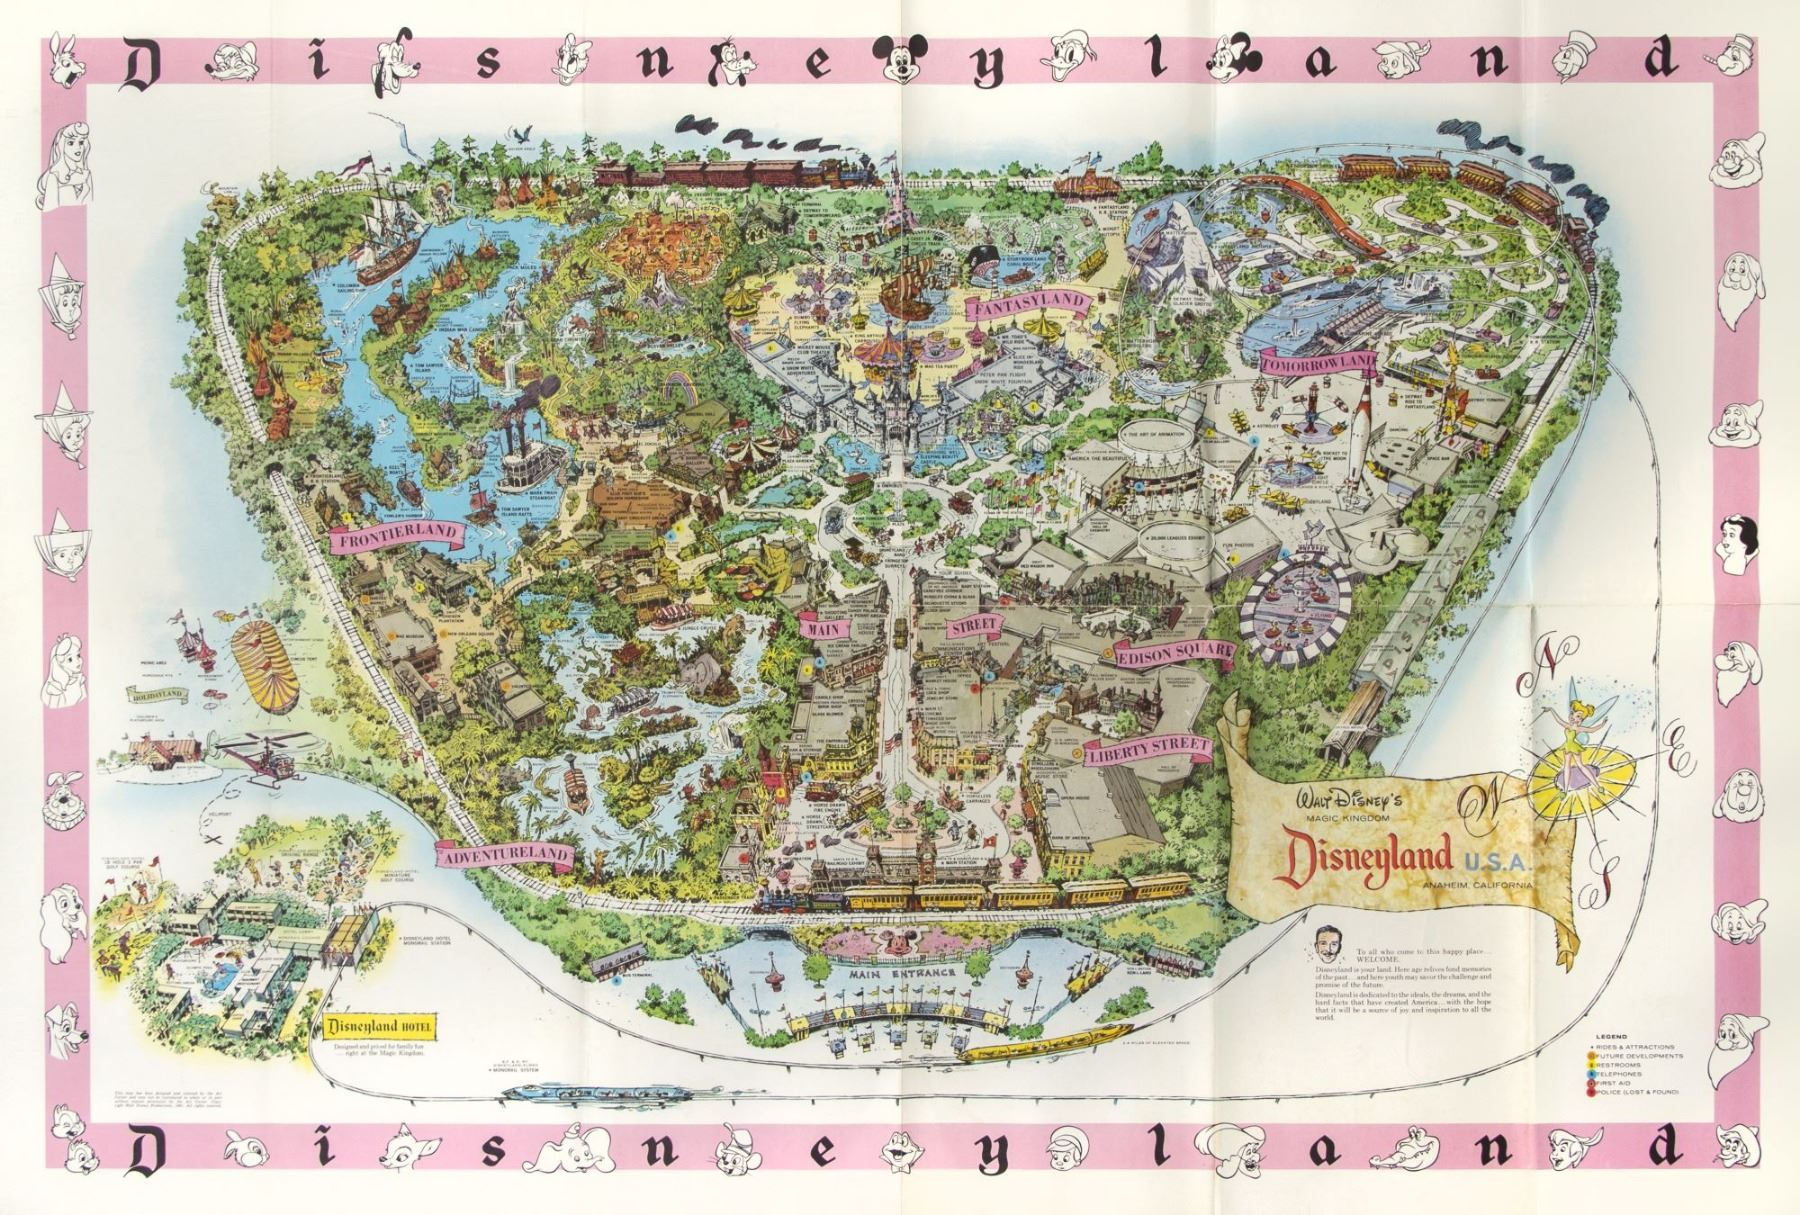 1961 Disneyland Map. on